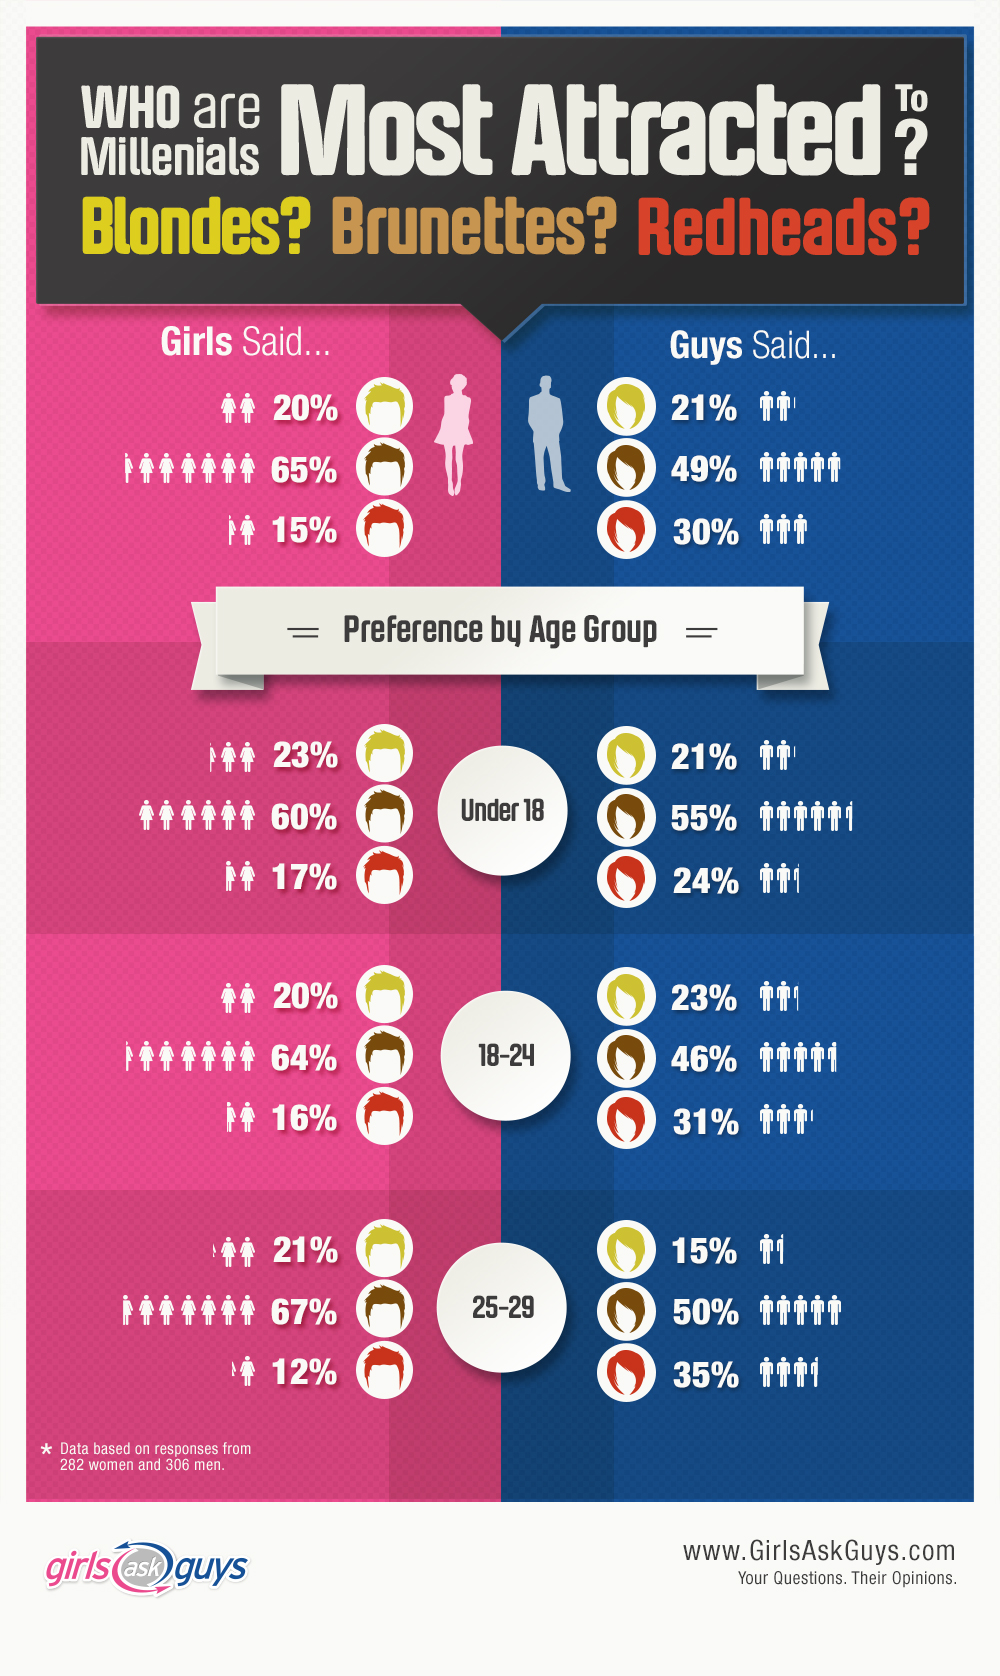 Girlsaskguys Study Millennials Overwhelming Prefer